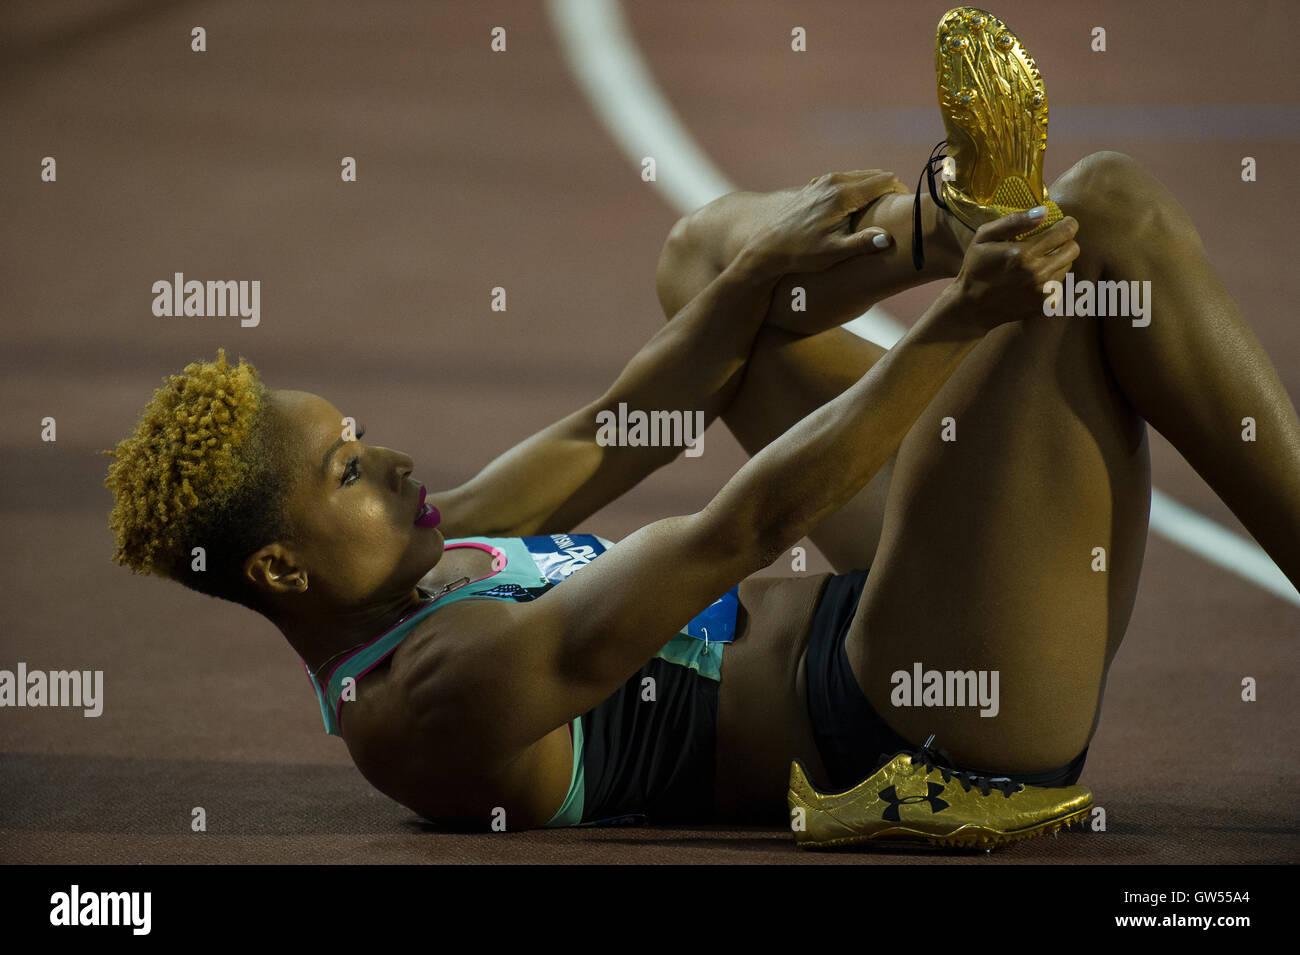 BRUSSELS, BELGIUM - SEPTEMBER 9: Natasha Hastings competing in the Women's 400m at the AG Insurance Memorial - Stock Image